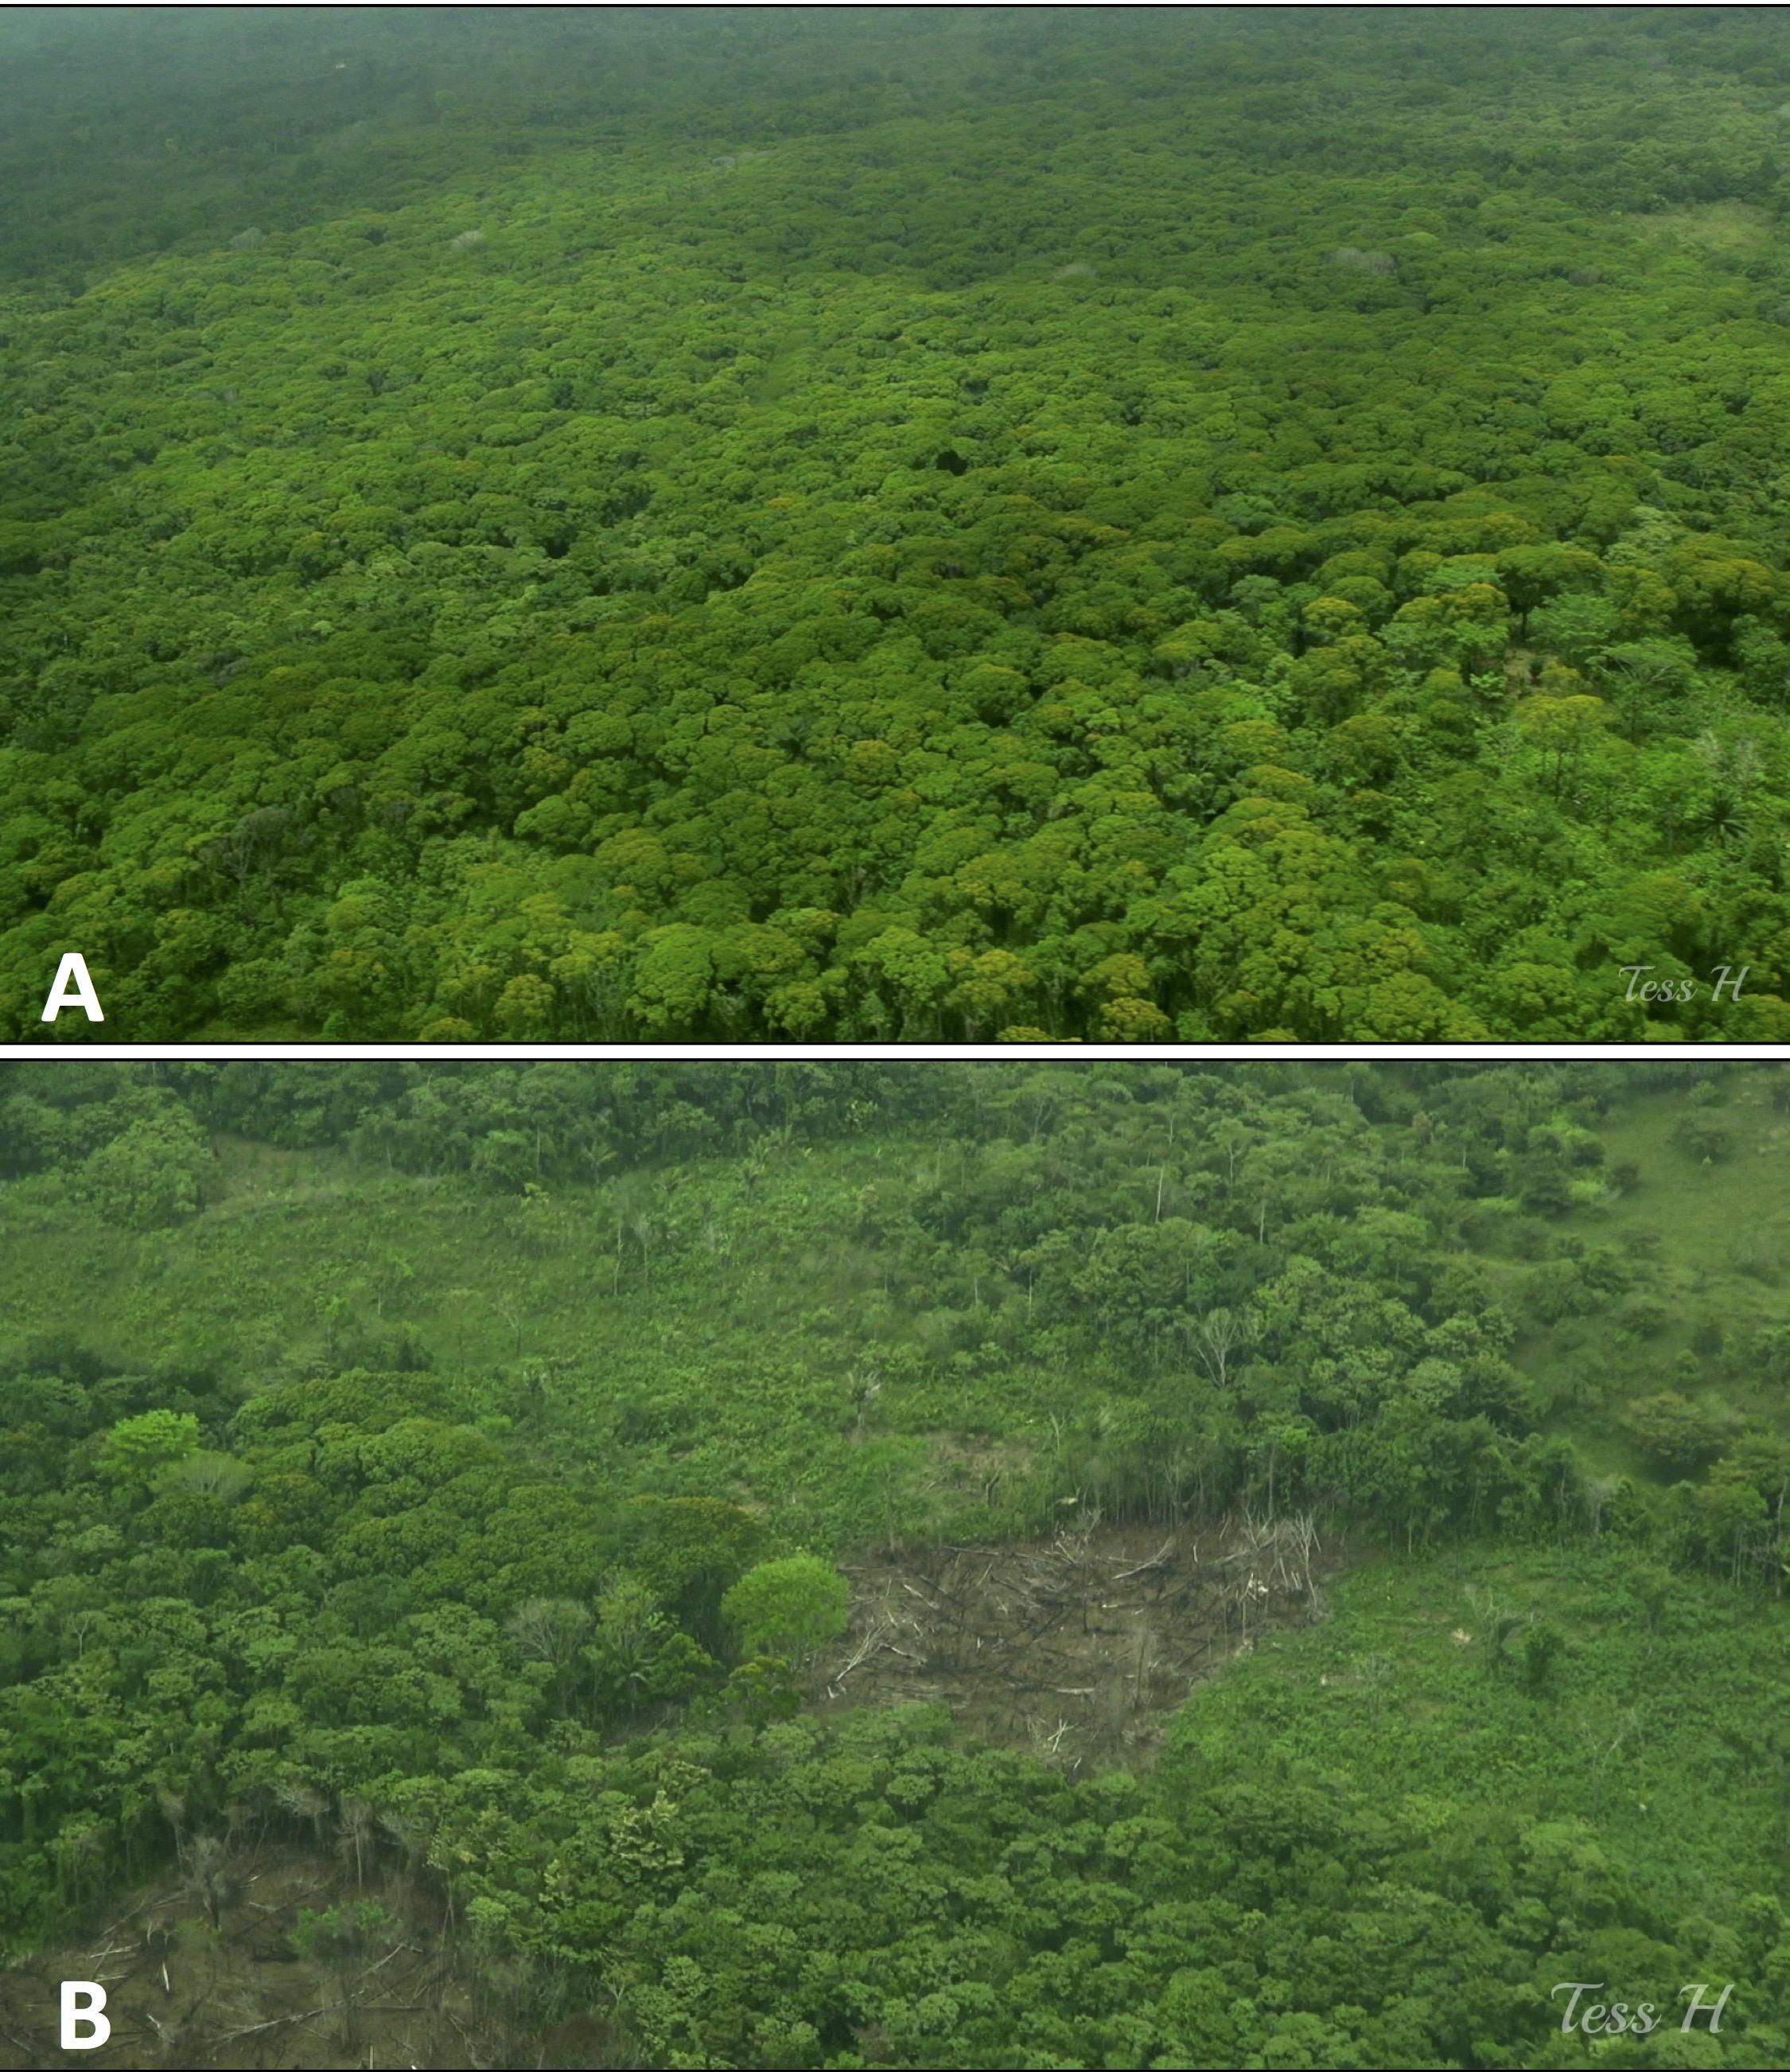 photo-2-unbroken-landscape-and-deforestation-cerro-silva